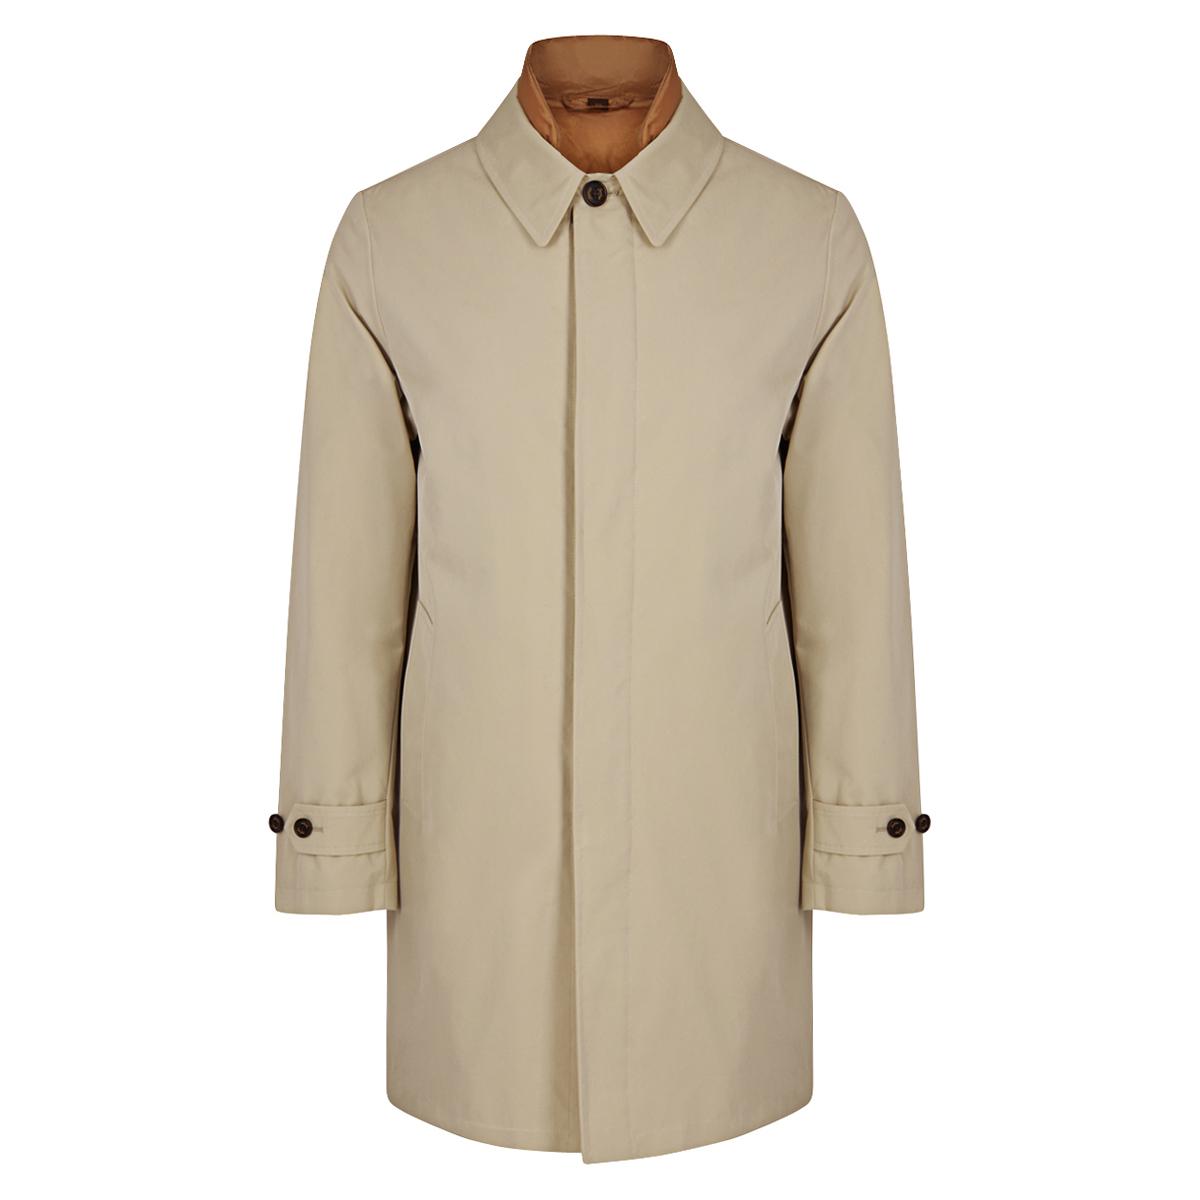 Beige and Gold 3-in-1 Detachable Vest Raincoat